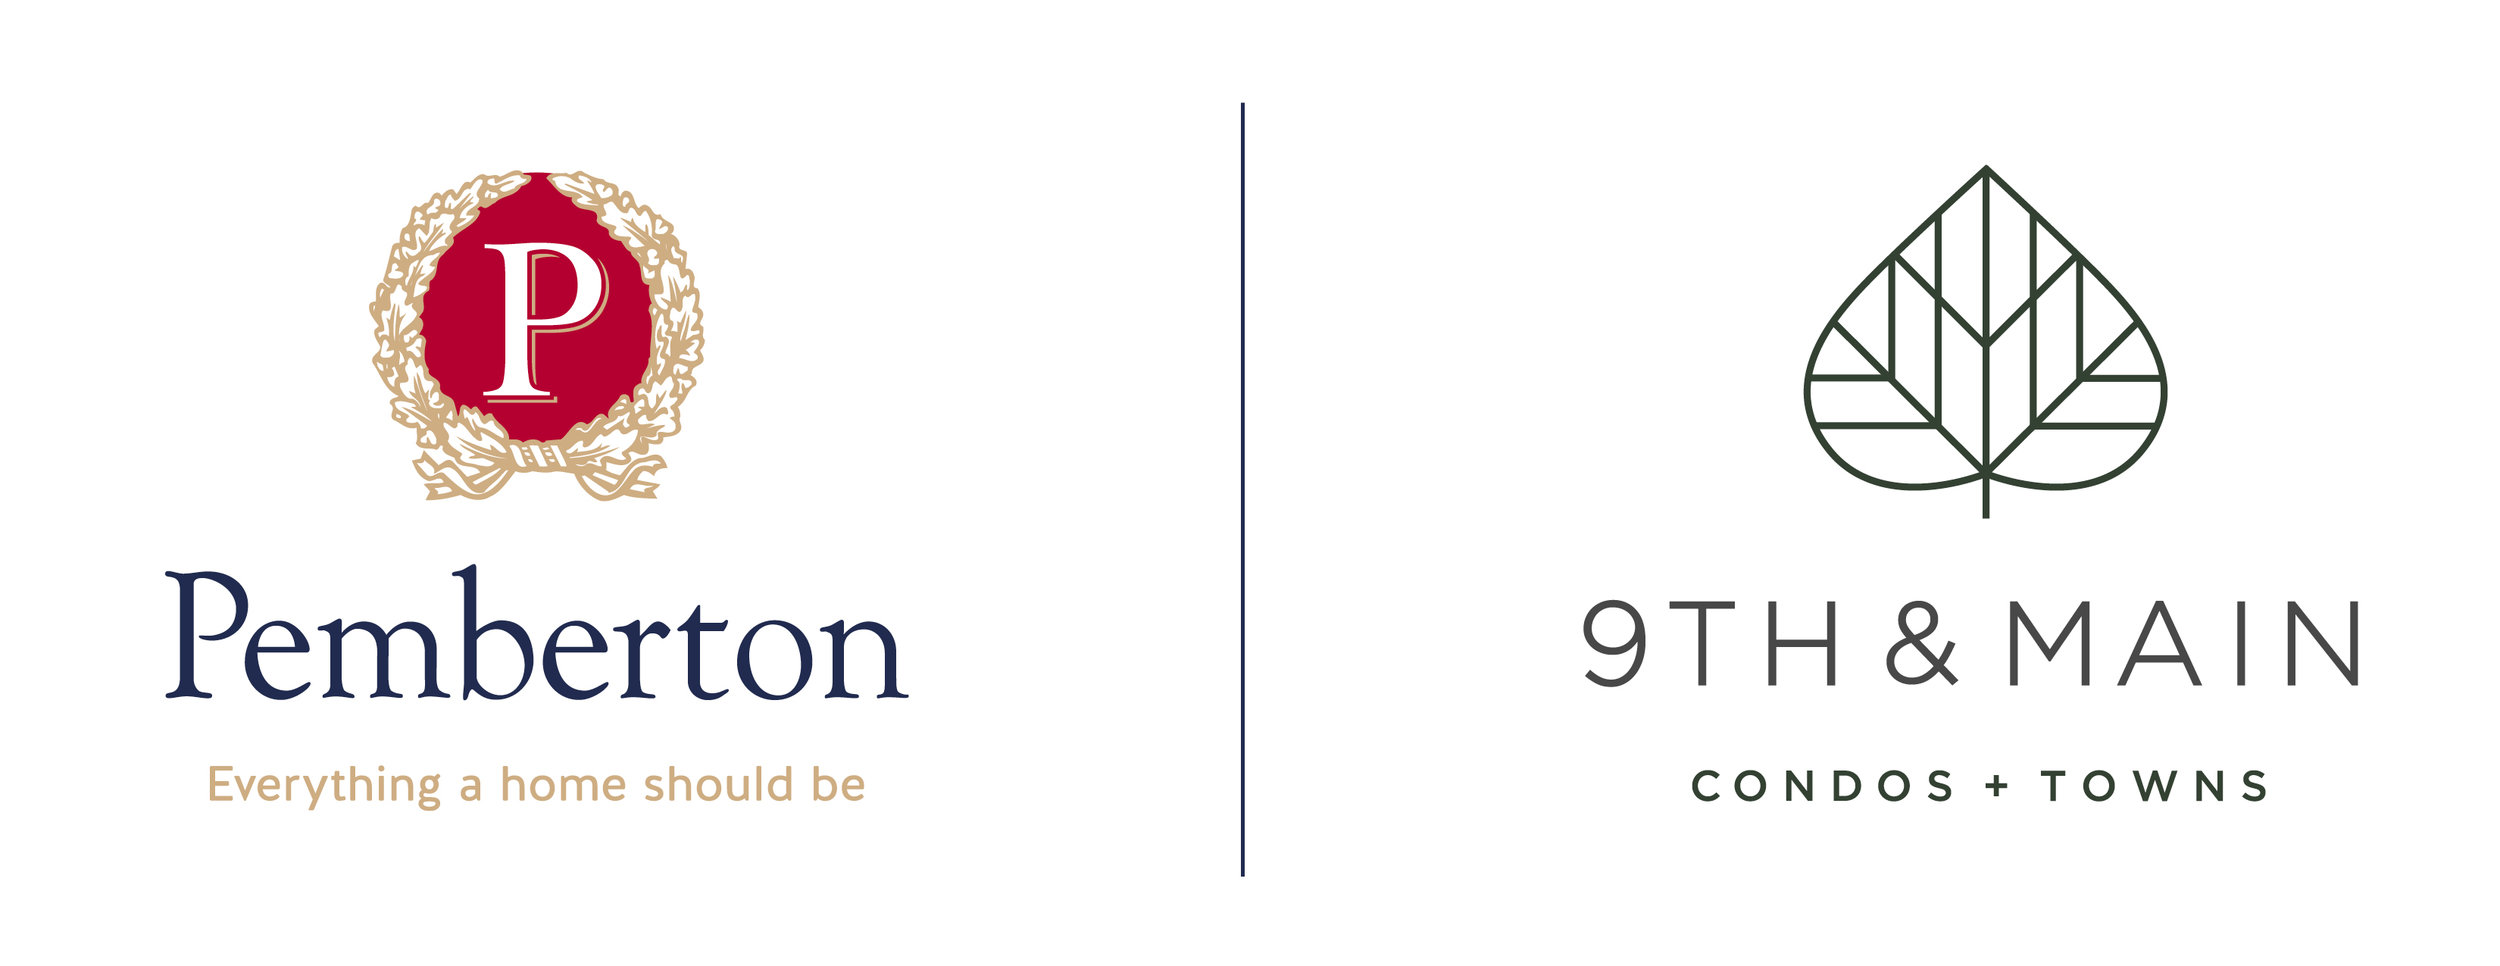 FORR 58293 Sponsorship Logo FA.jpg